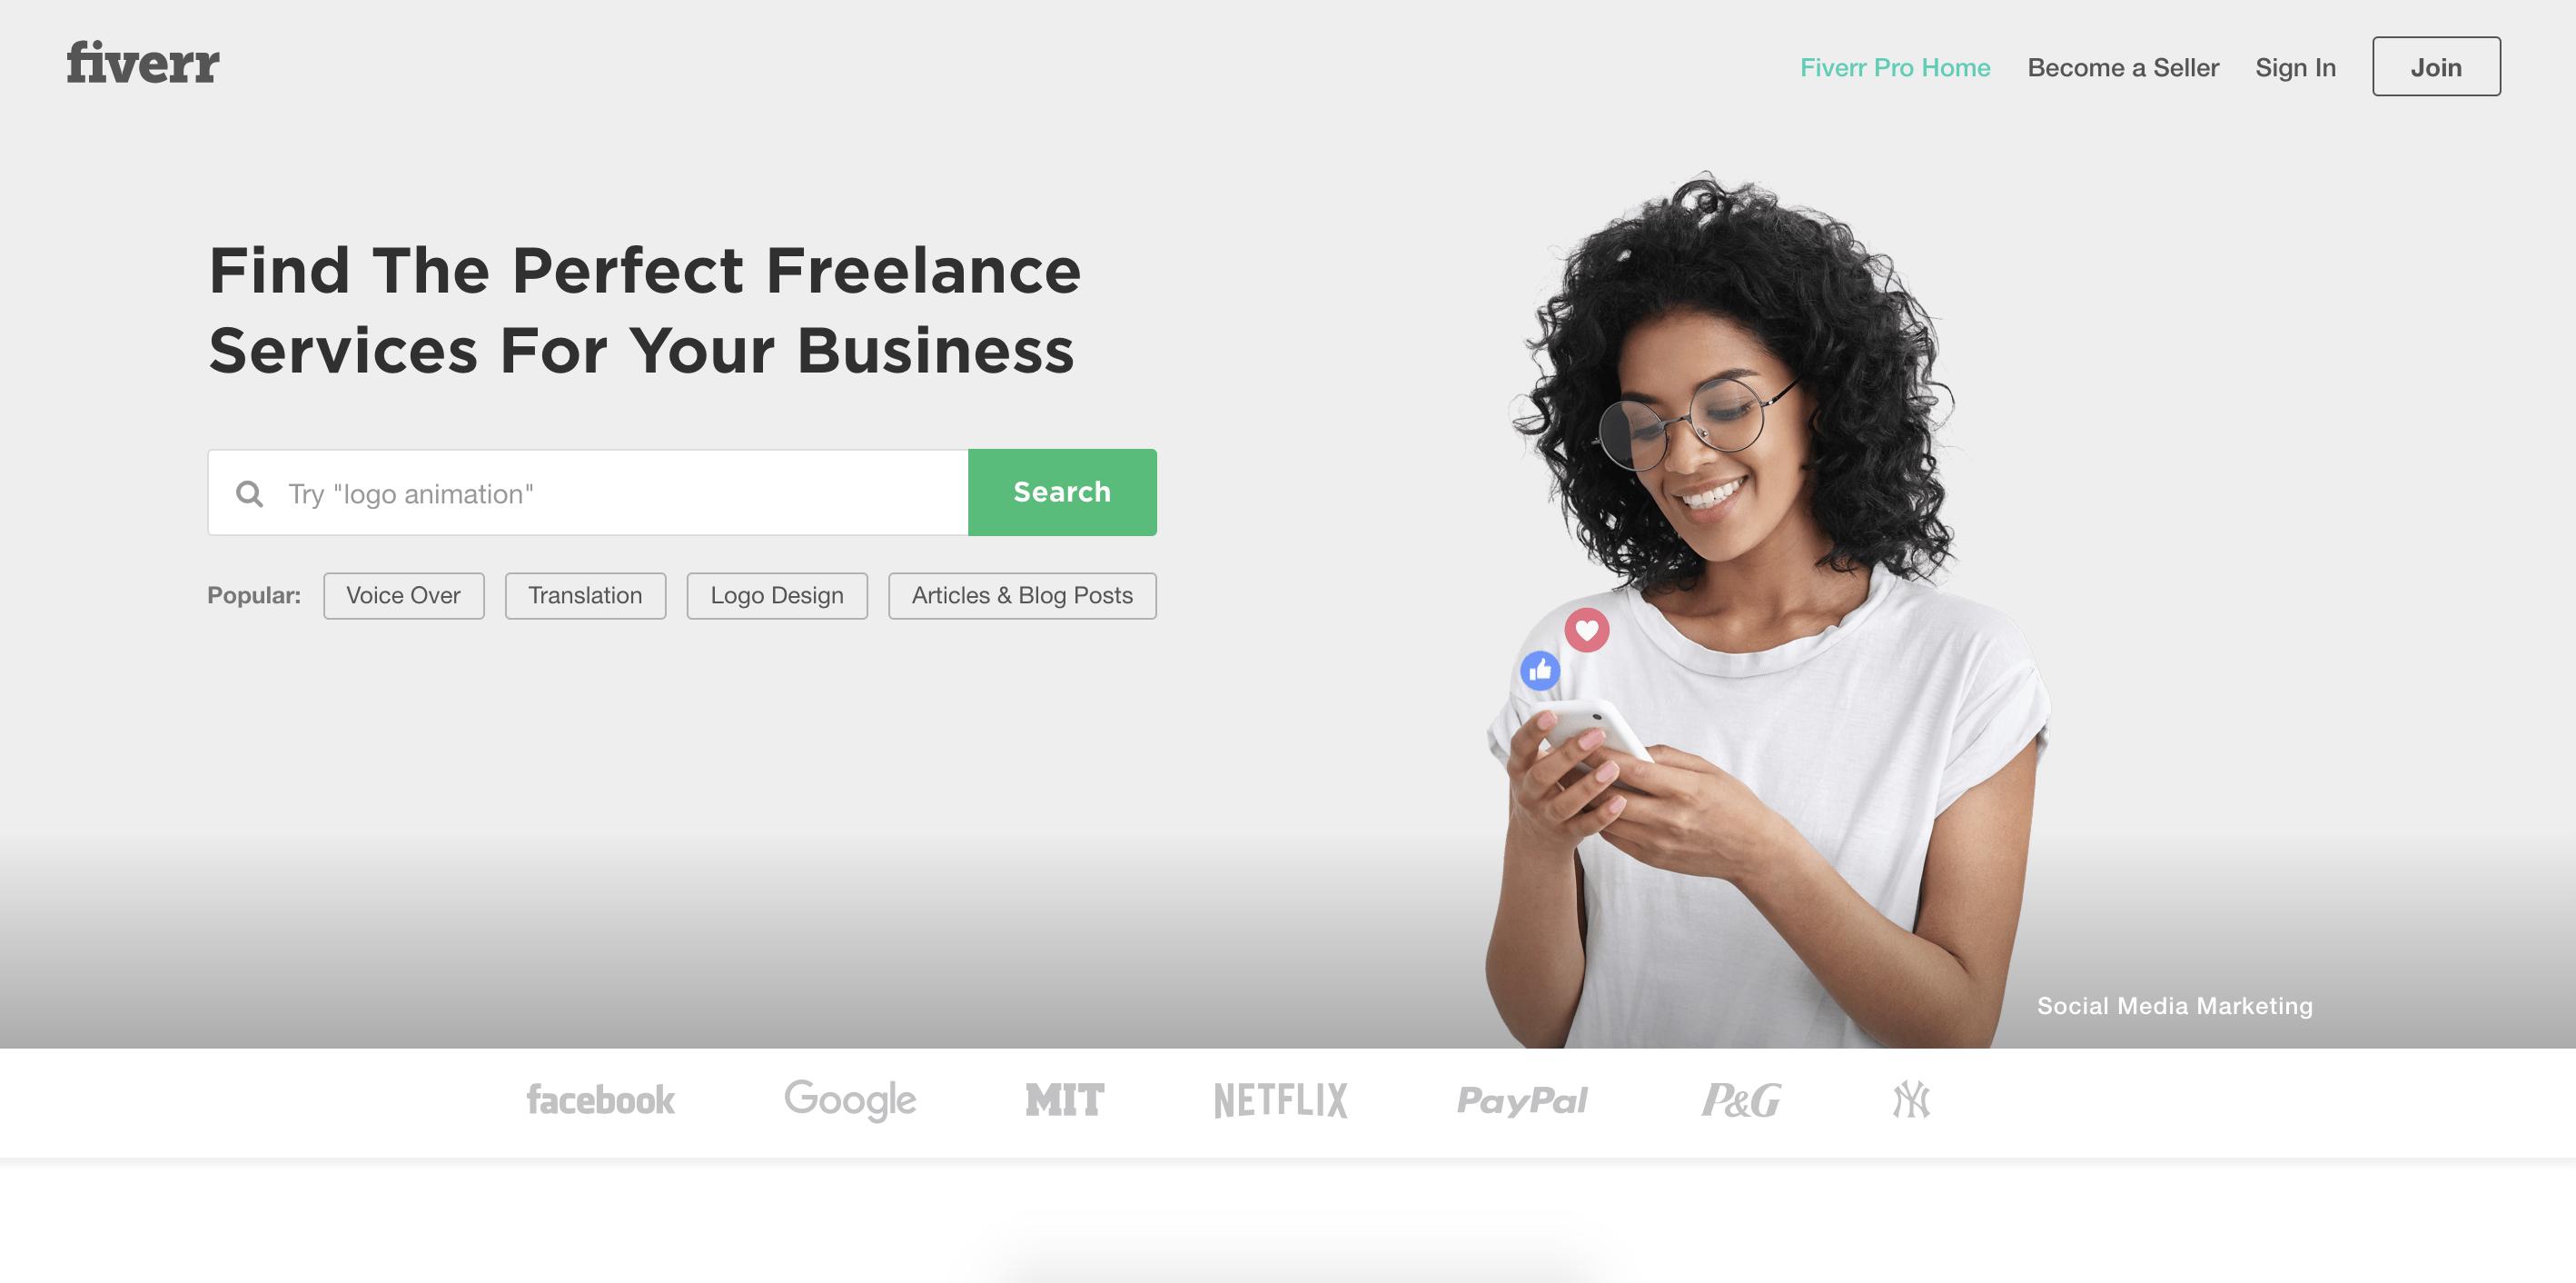 fiverr-plateforme-freelance